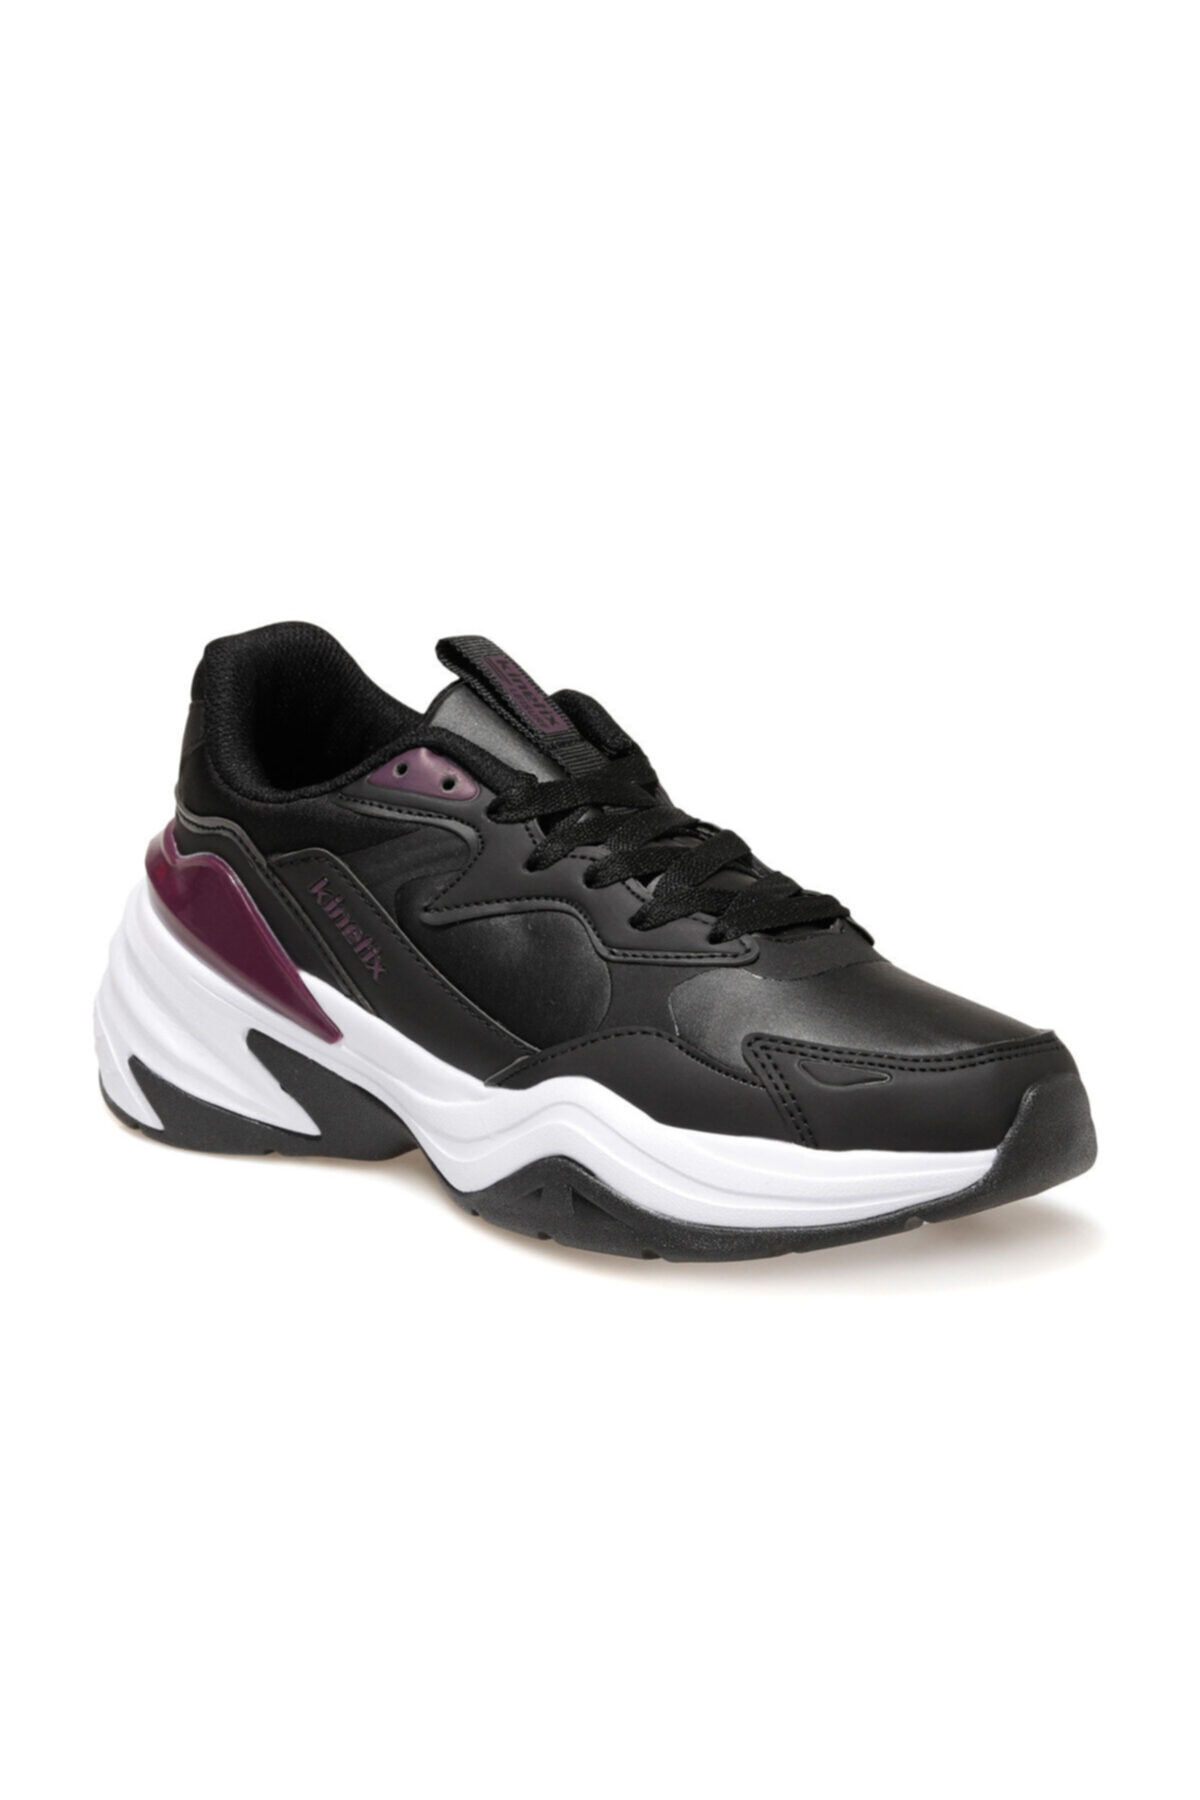 Kinetix REGAL PU W Siyah Kadın Sneaker Ayakkabı 100536054 1